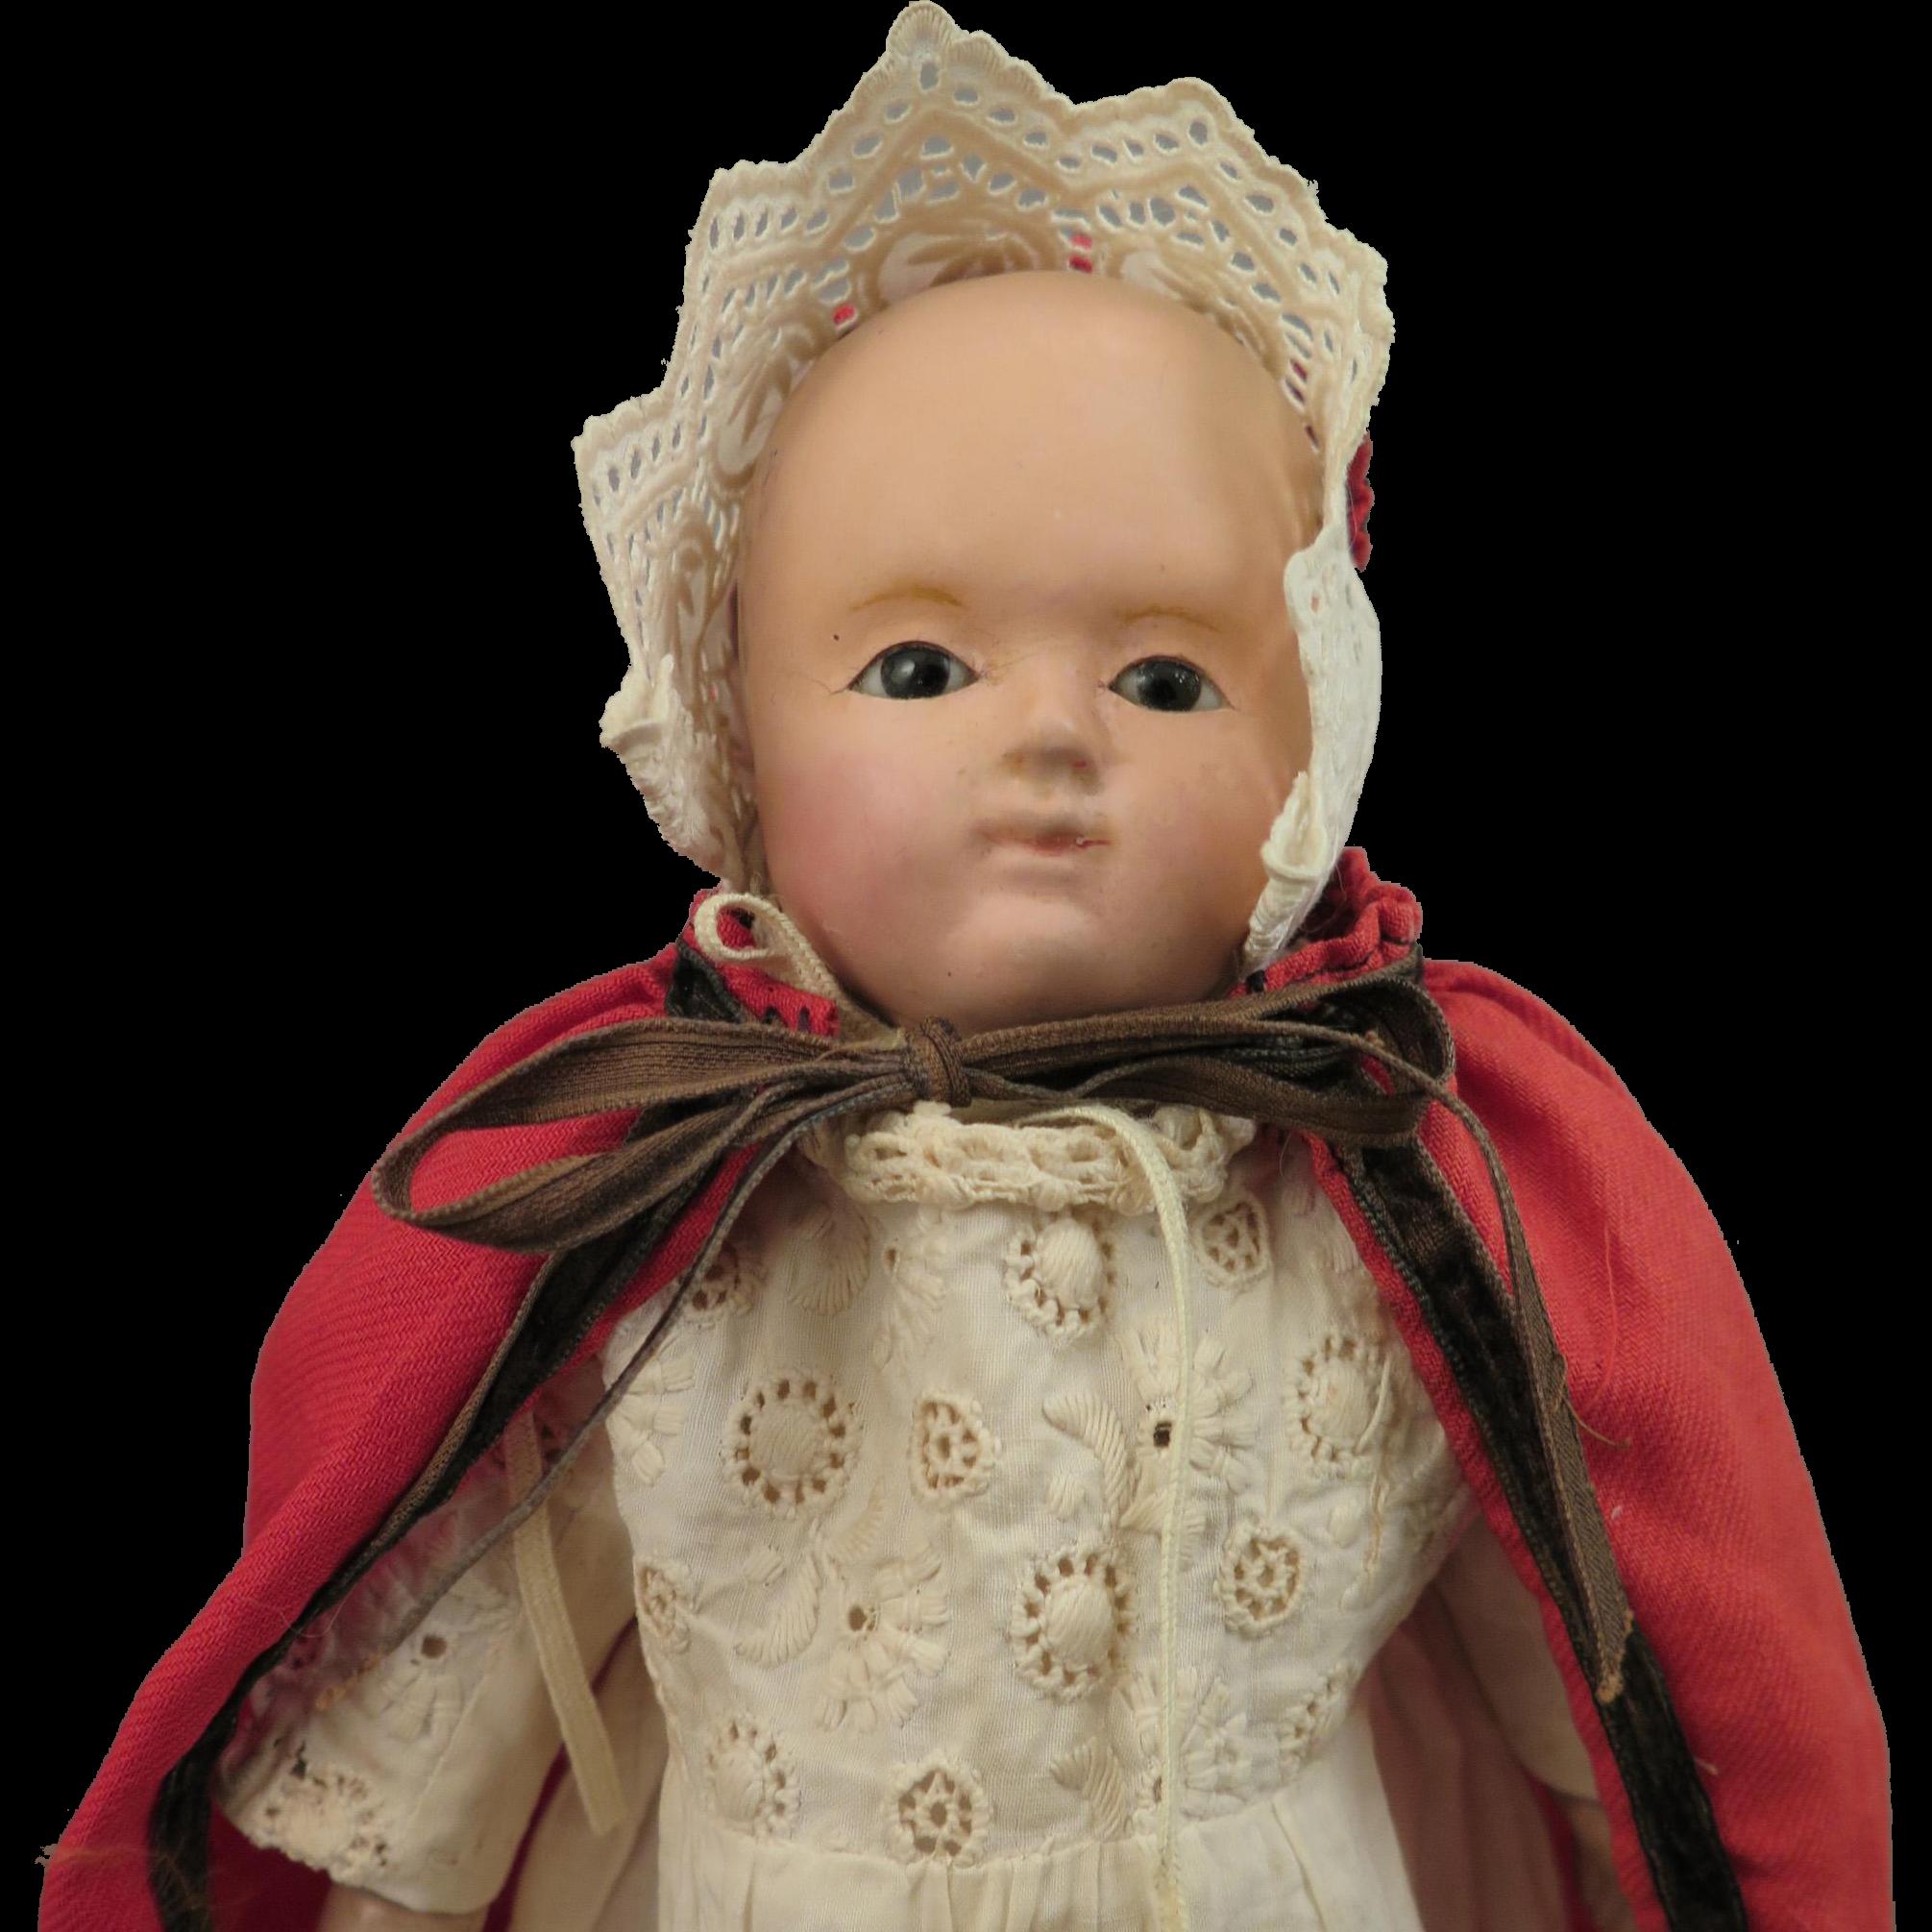 Mid 1800s German Motschmann Taufling Baby Doll 9 inches